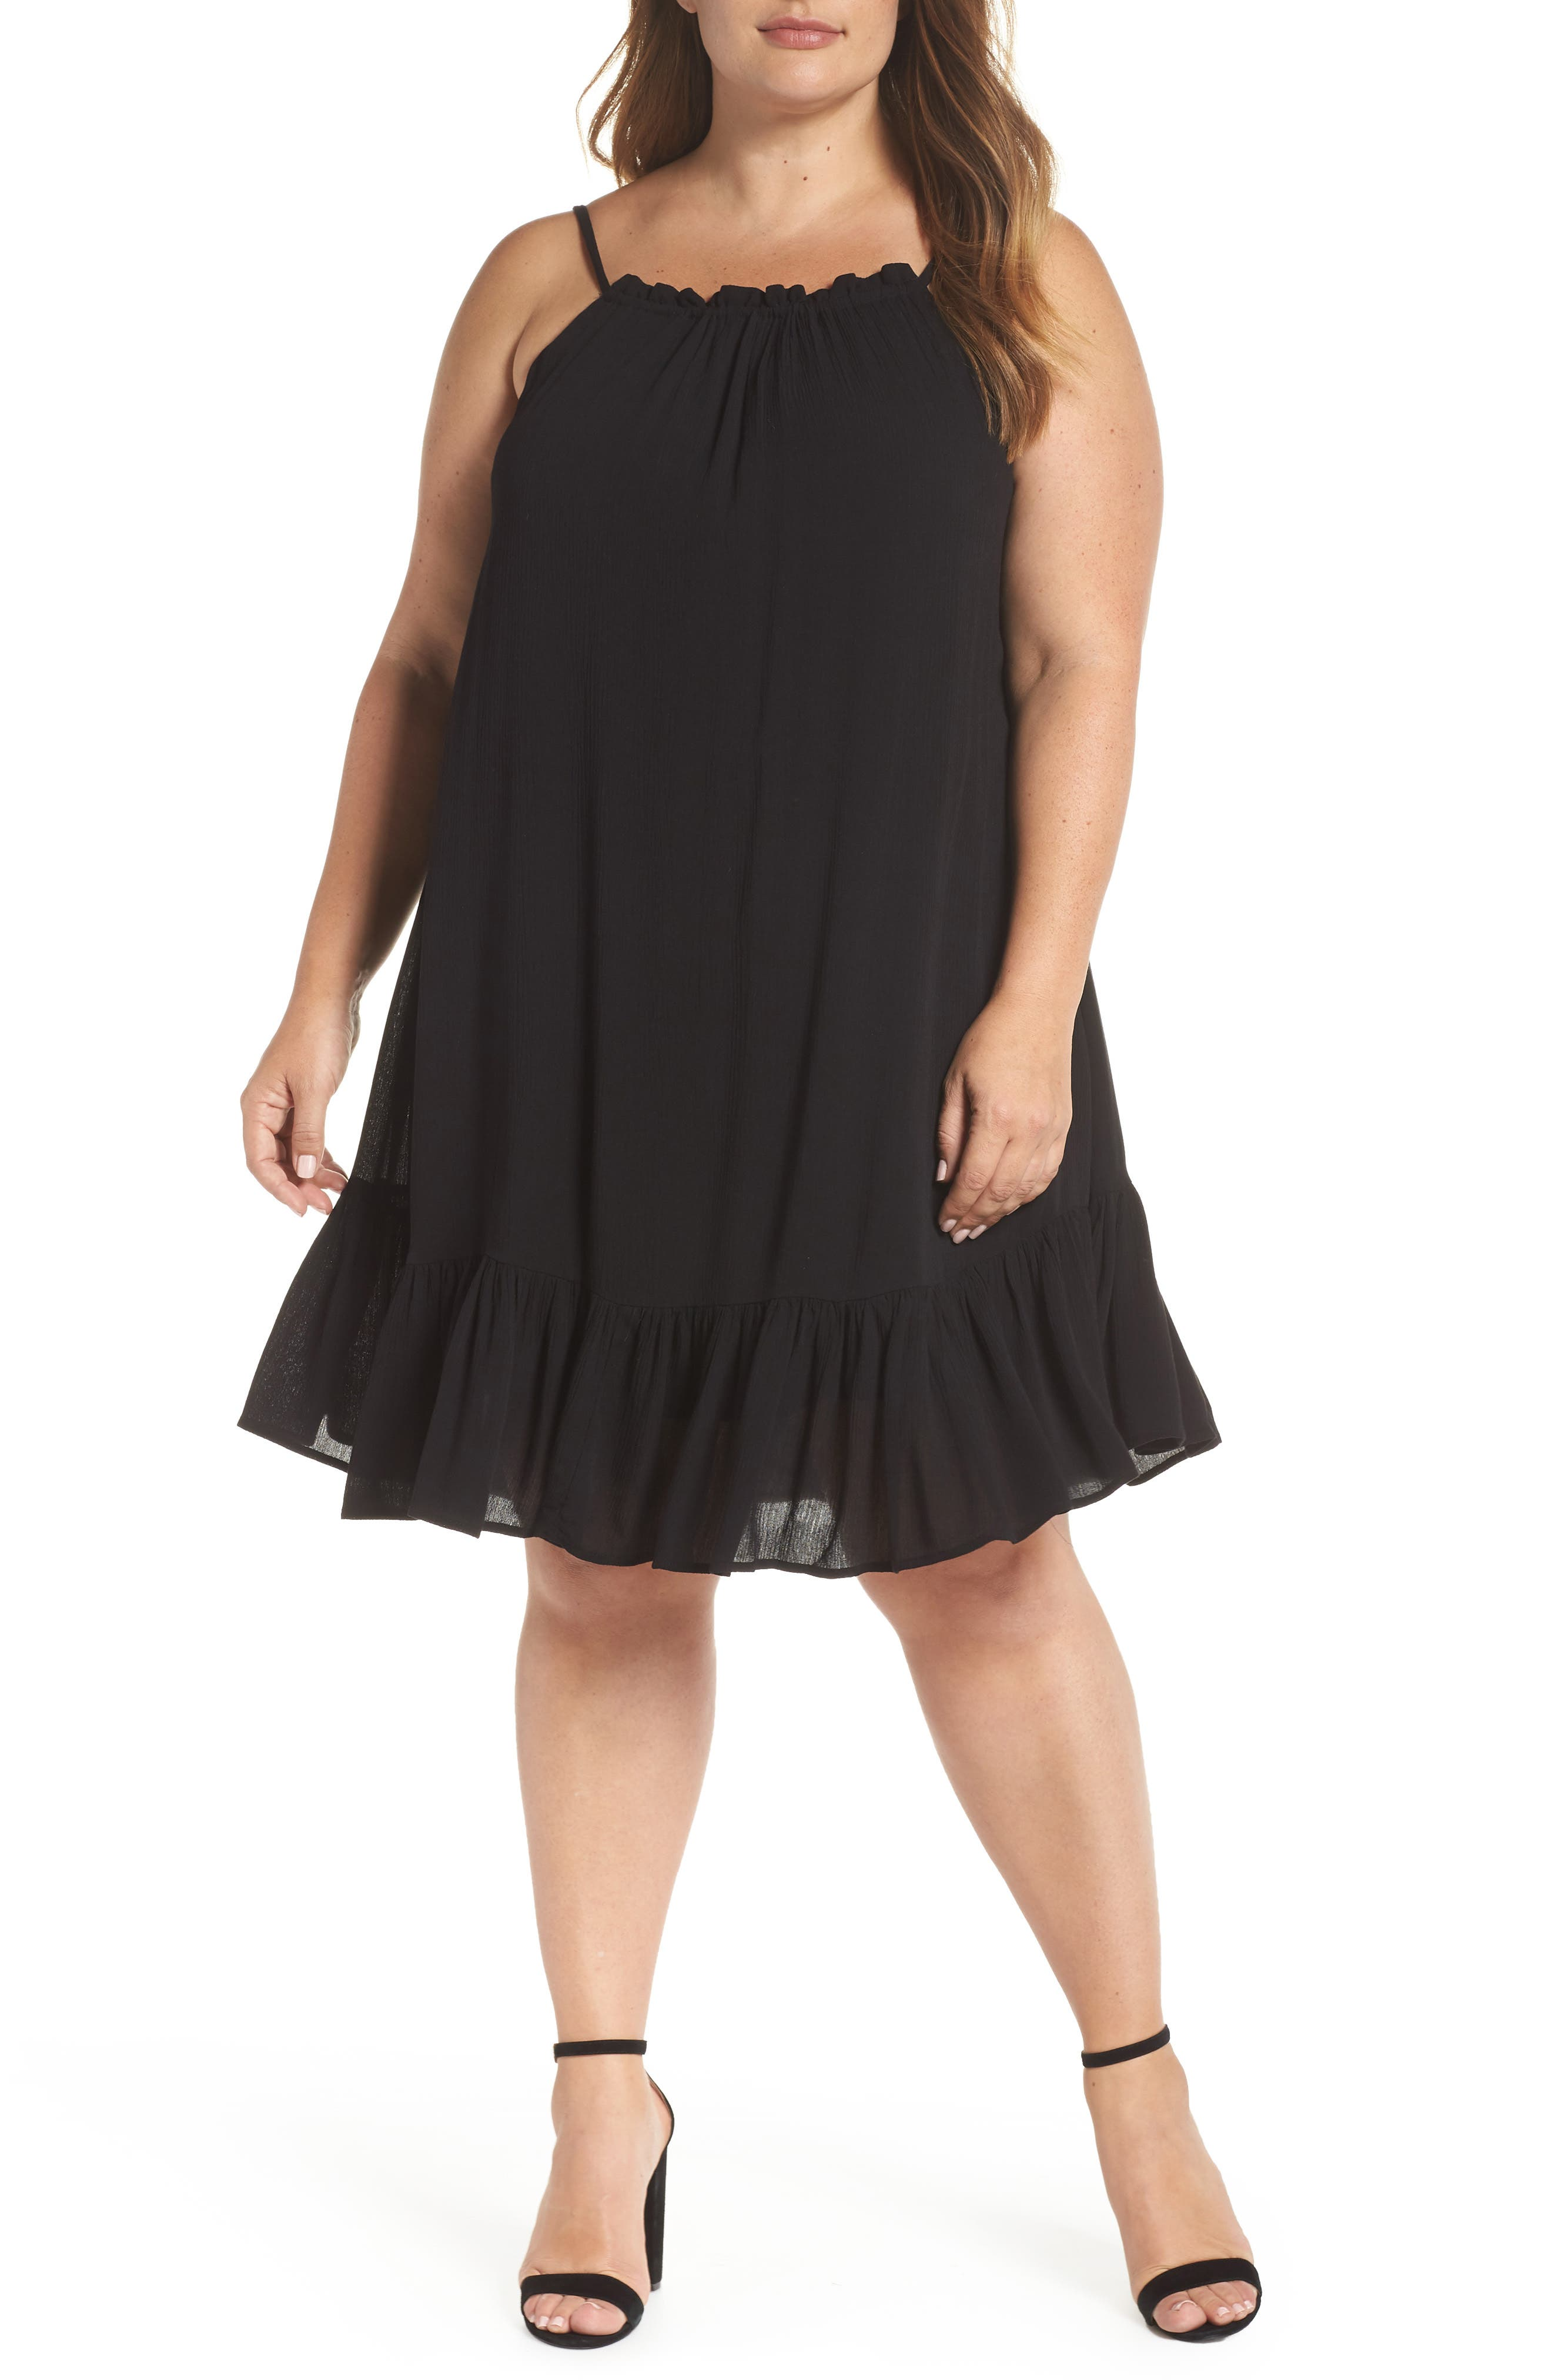 Plus Size Tart Liz Halter Top Baby Doll Dress, Black